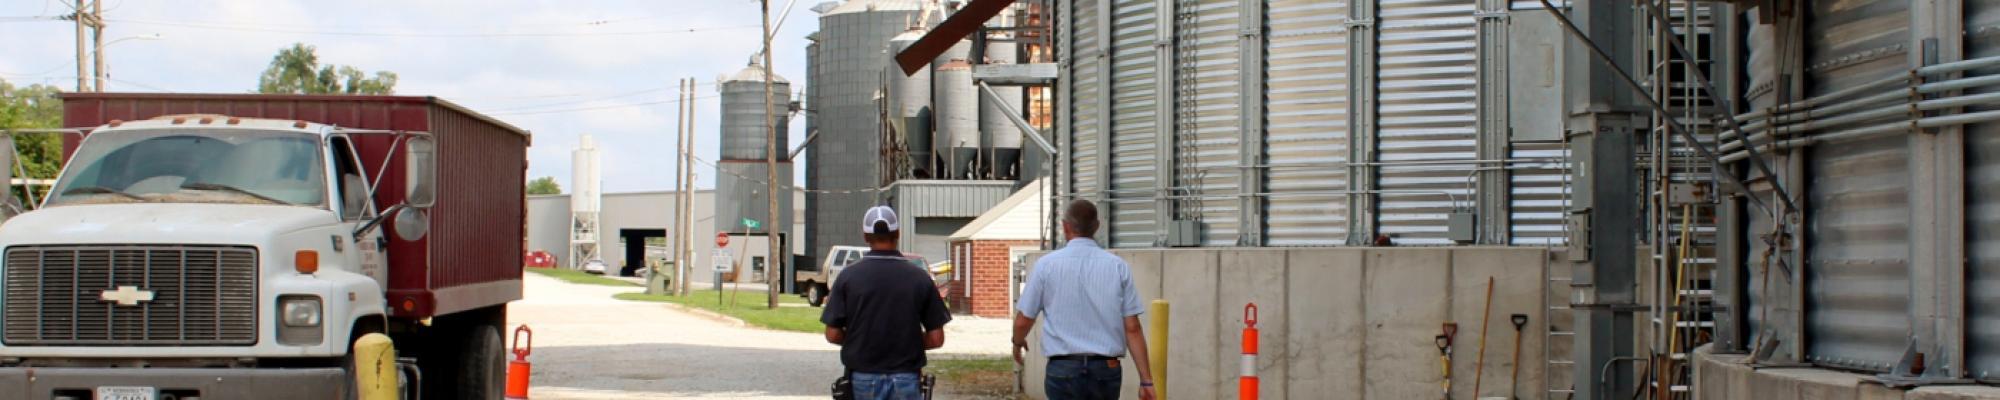 Grain Examination